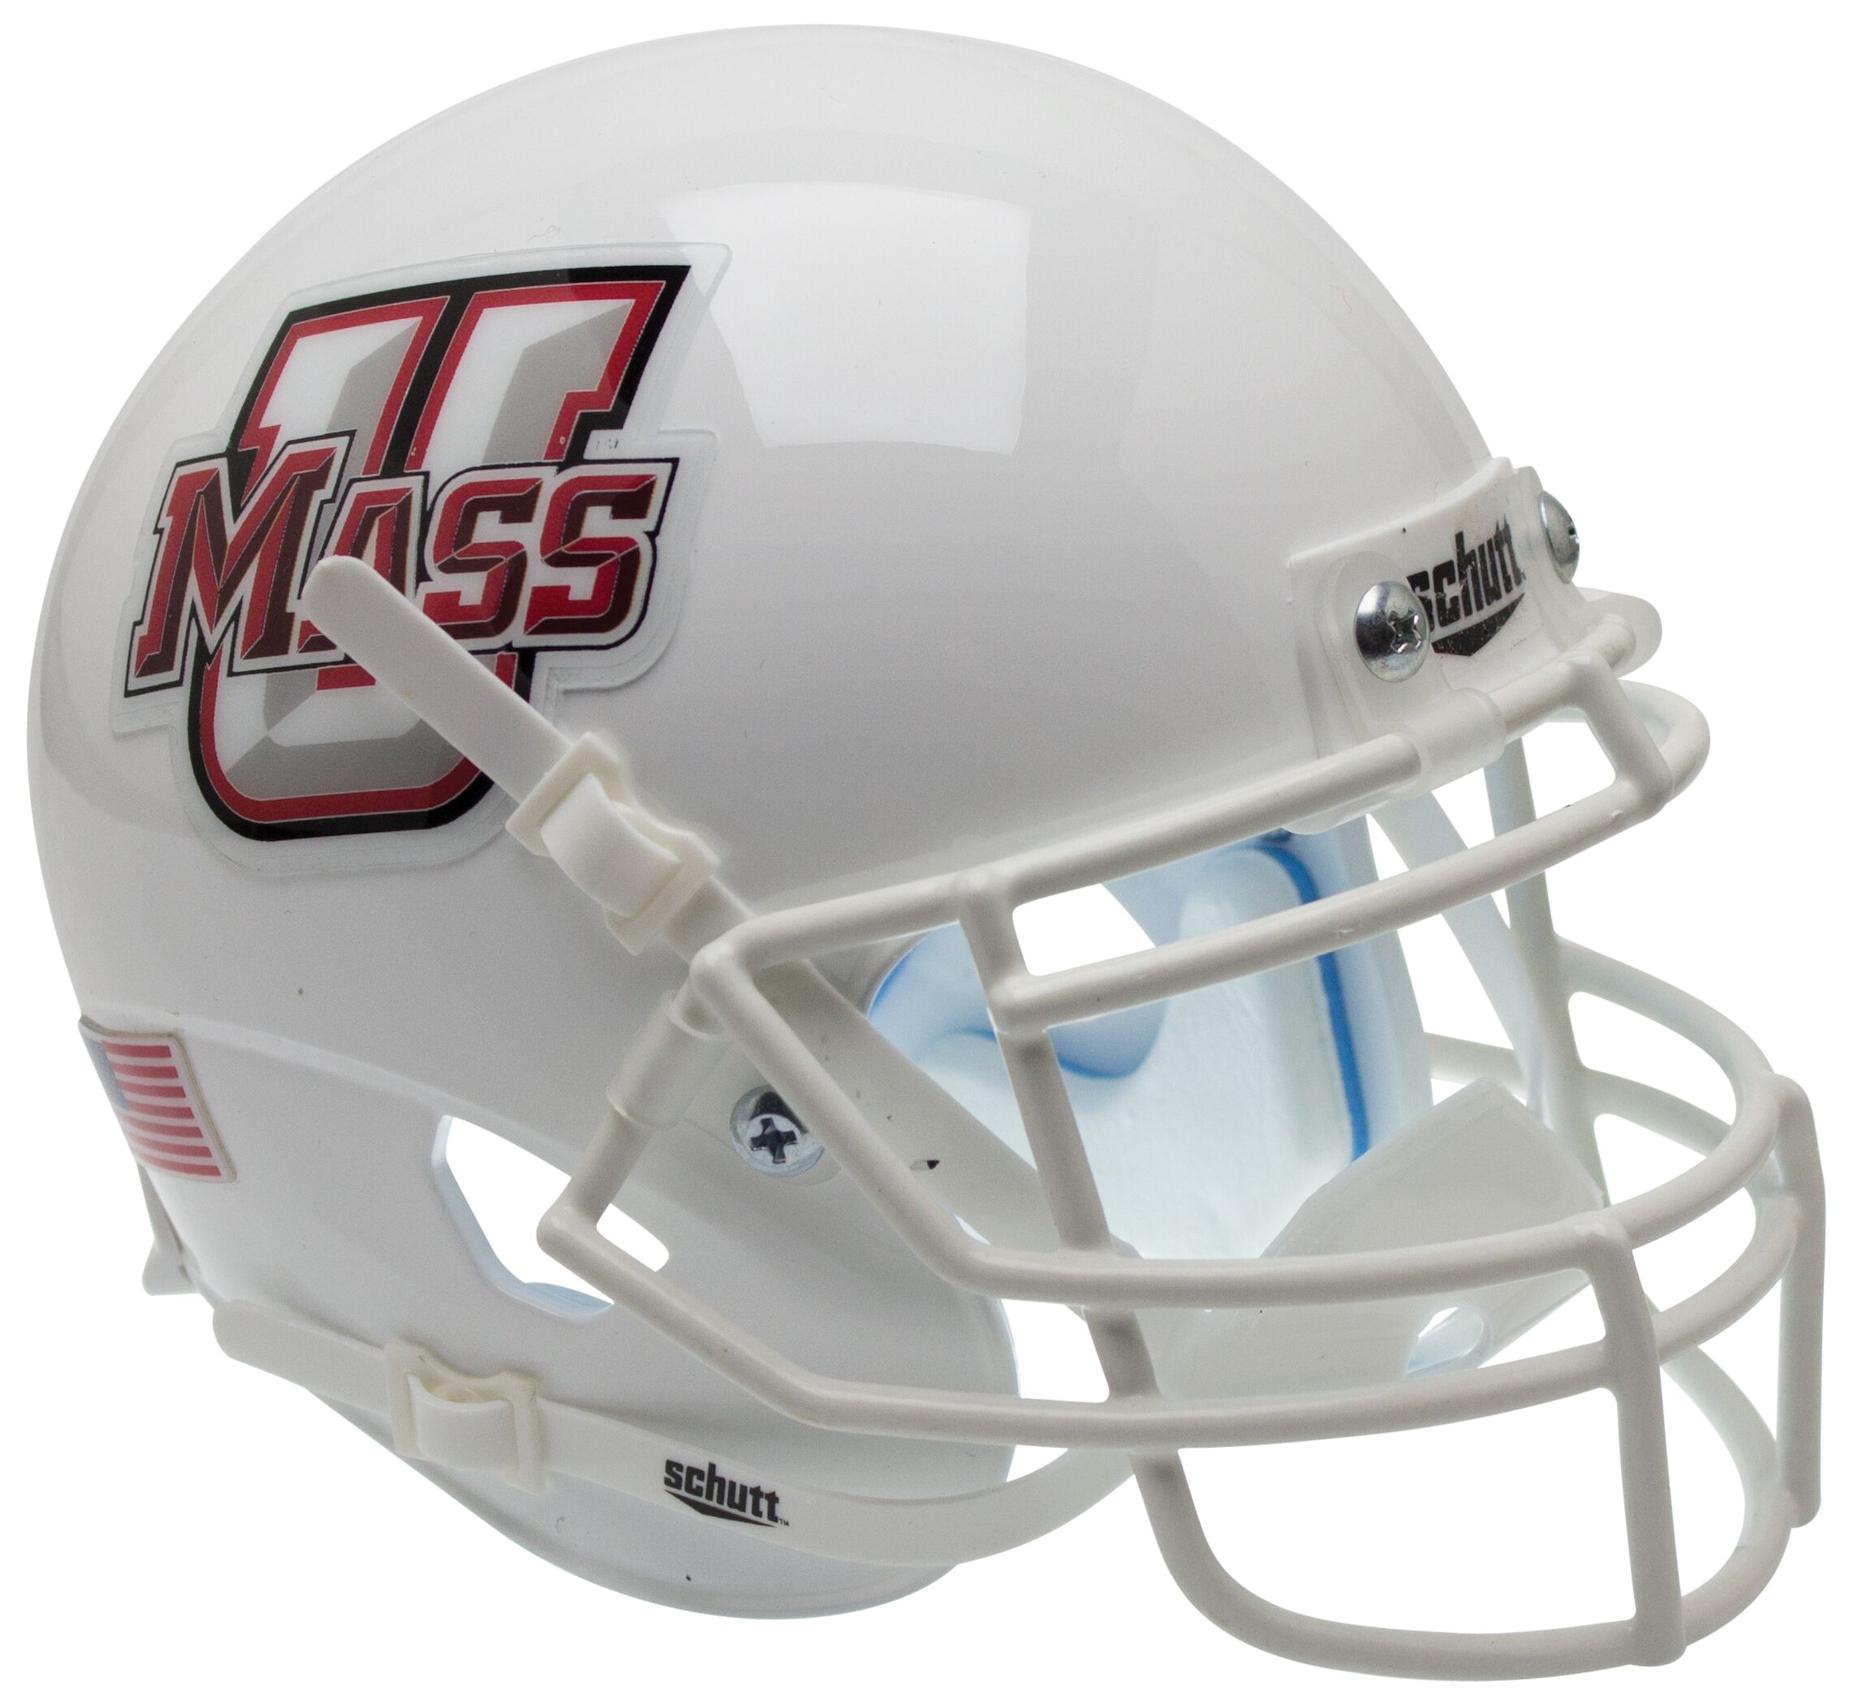 U Mass Minutemen Authentic College XP Football Helmet Schutt <B>White</B>